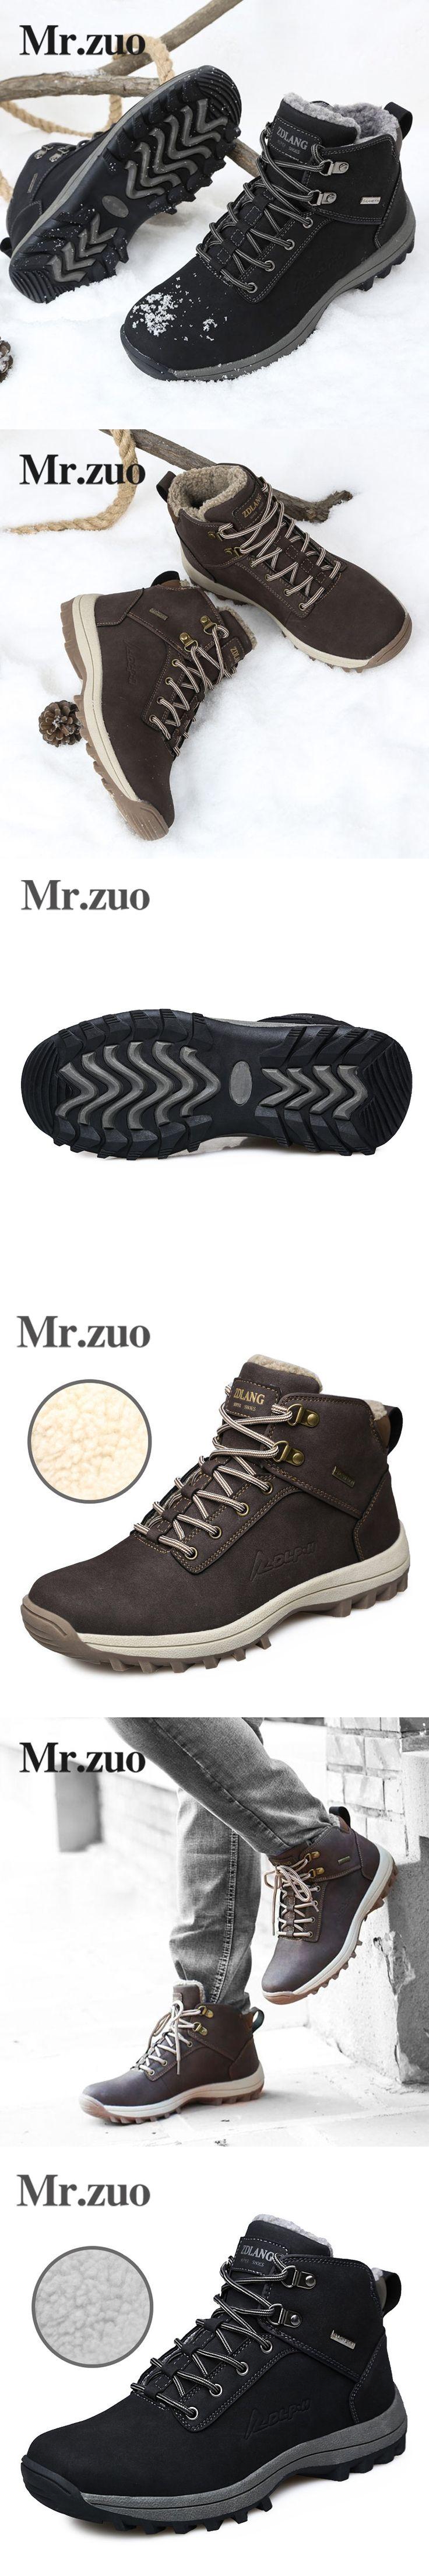 Men's Winter Sneakers 2017 Hiking Shoes boots Men Footwear Keep Warm Snow Shoes Trekking Boots Outdoor Big Sizes 45 46